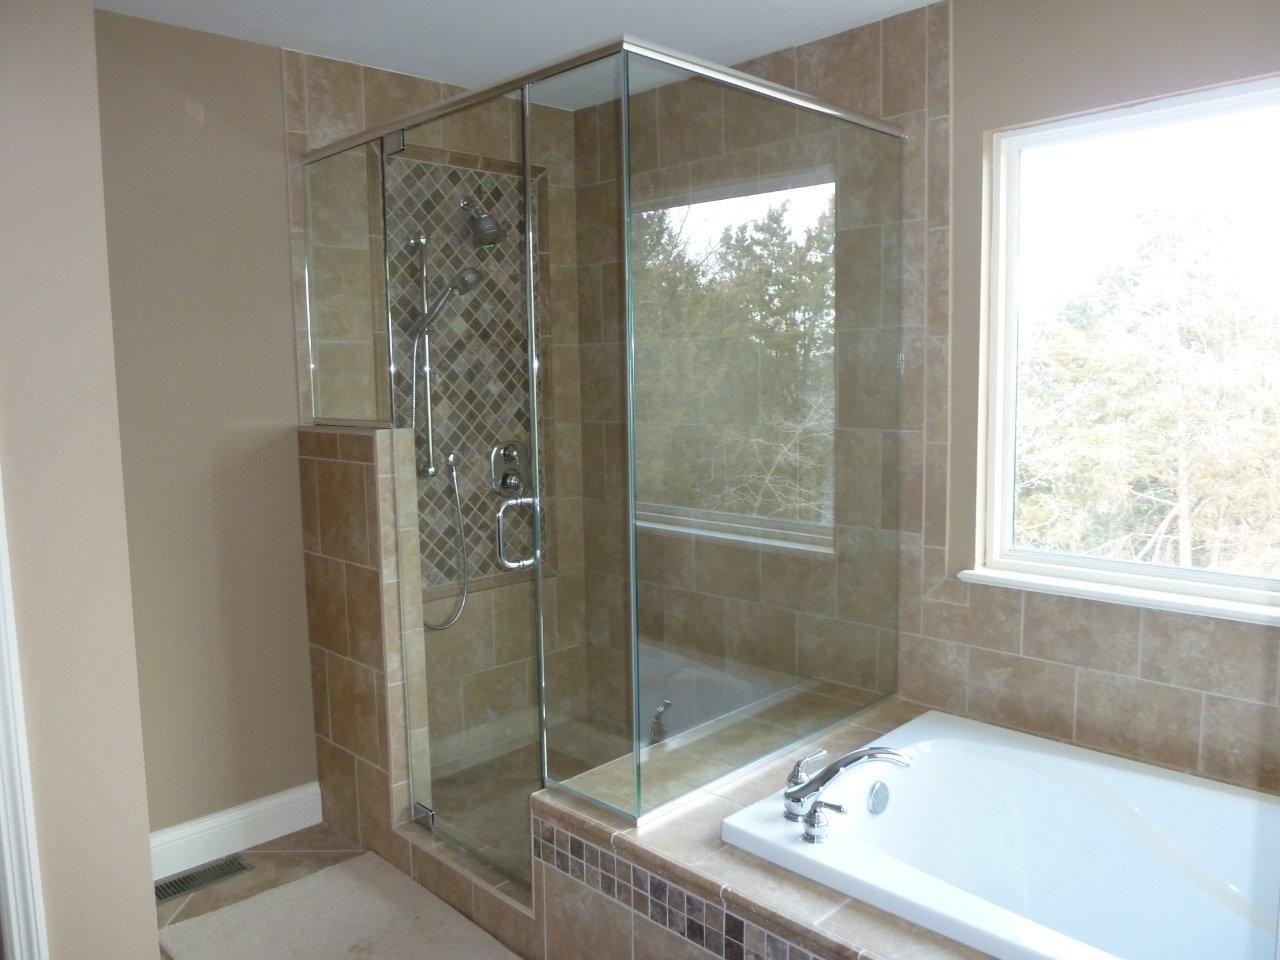 Fresh Bathroom Sets at Walmart Layout - Home Sweet Home ...